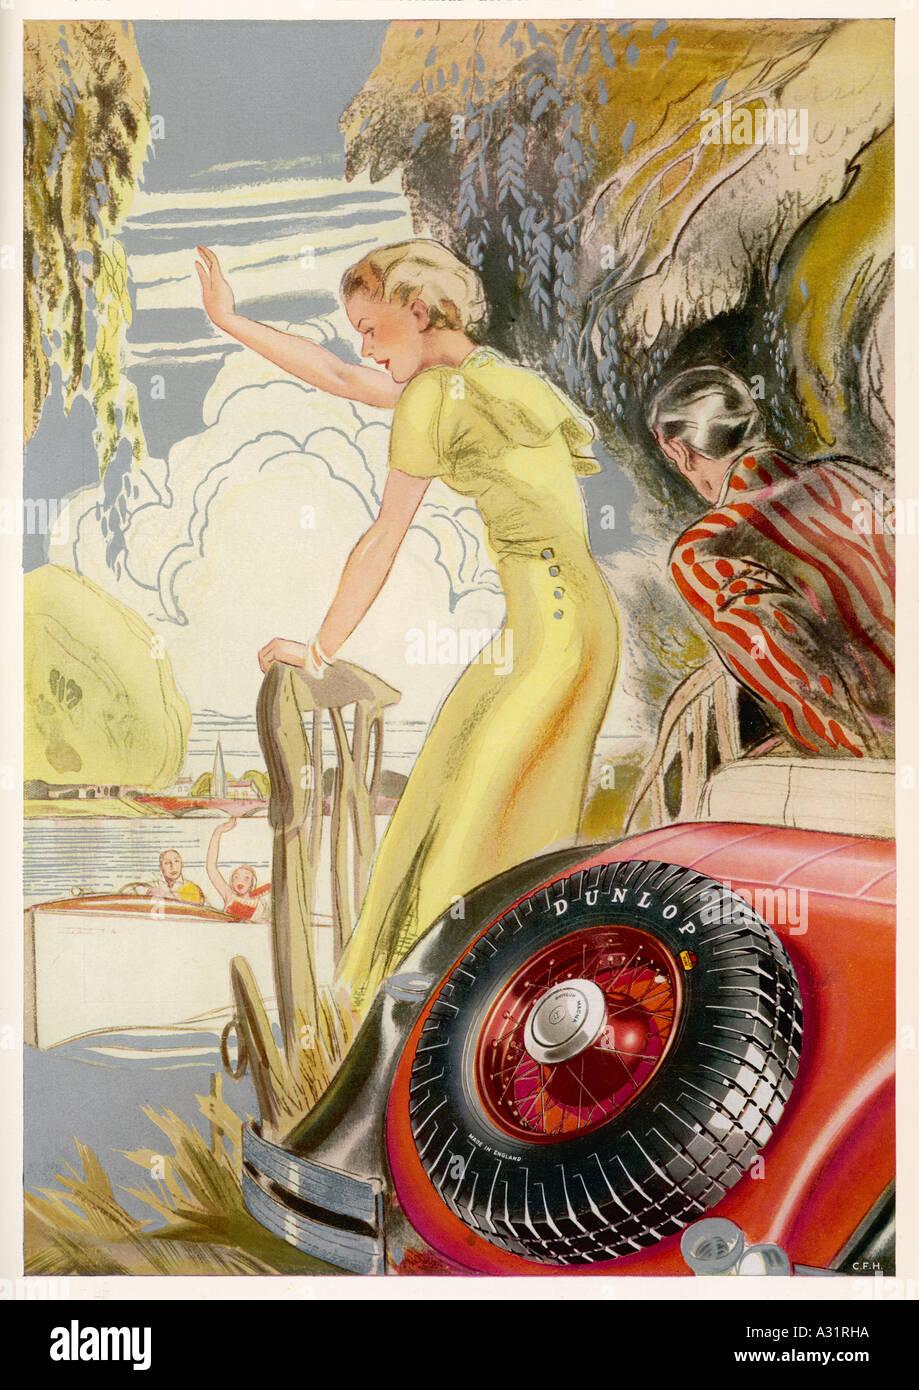 Anzeige-Dunlop-Reifen 1934 Stockbild